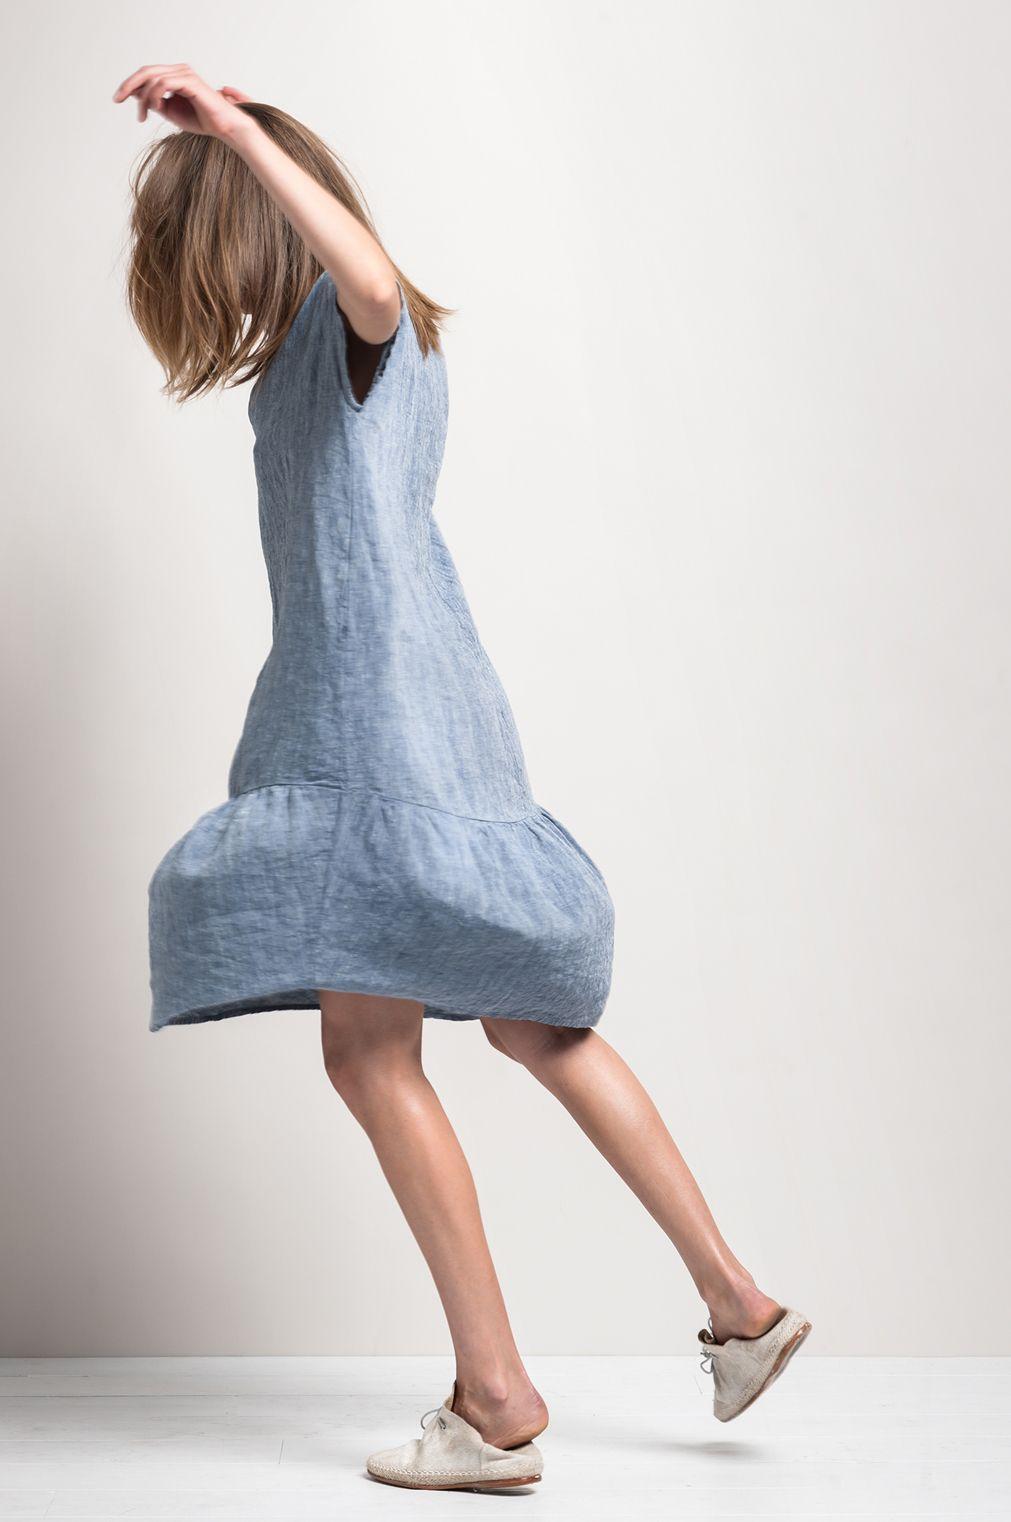 CEMENT › DRESSES › HUMANOID WEBSHOP